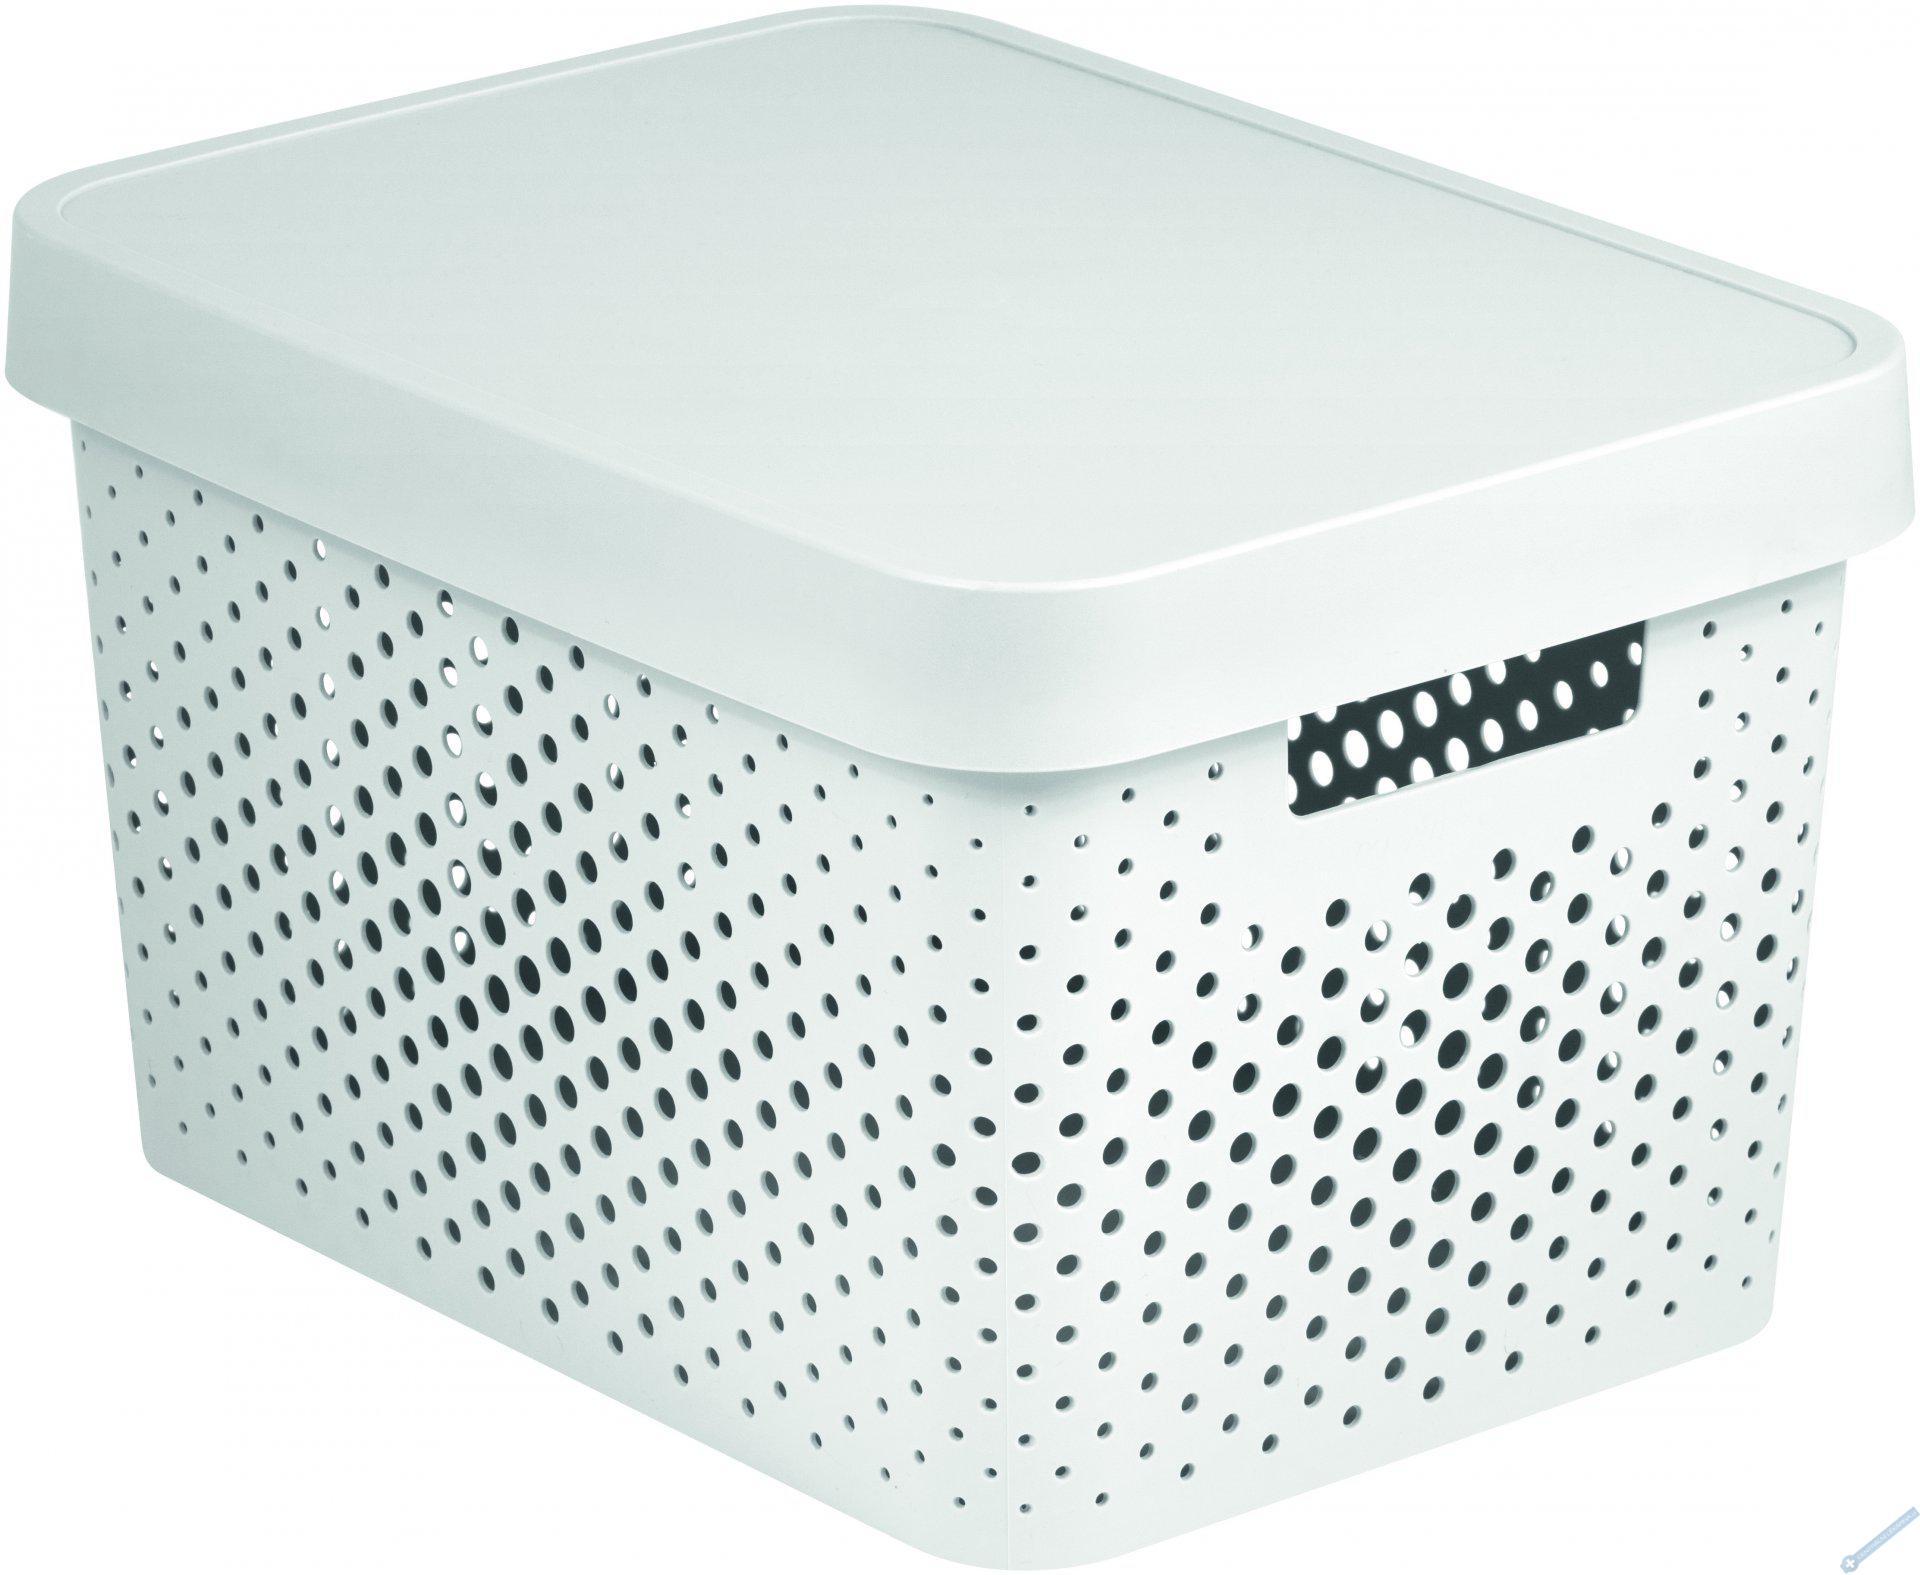 Úložný box INFINITY 17l s víkem bílý puntíky